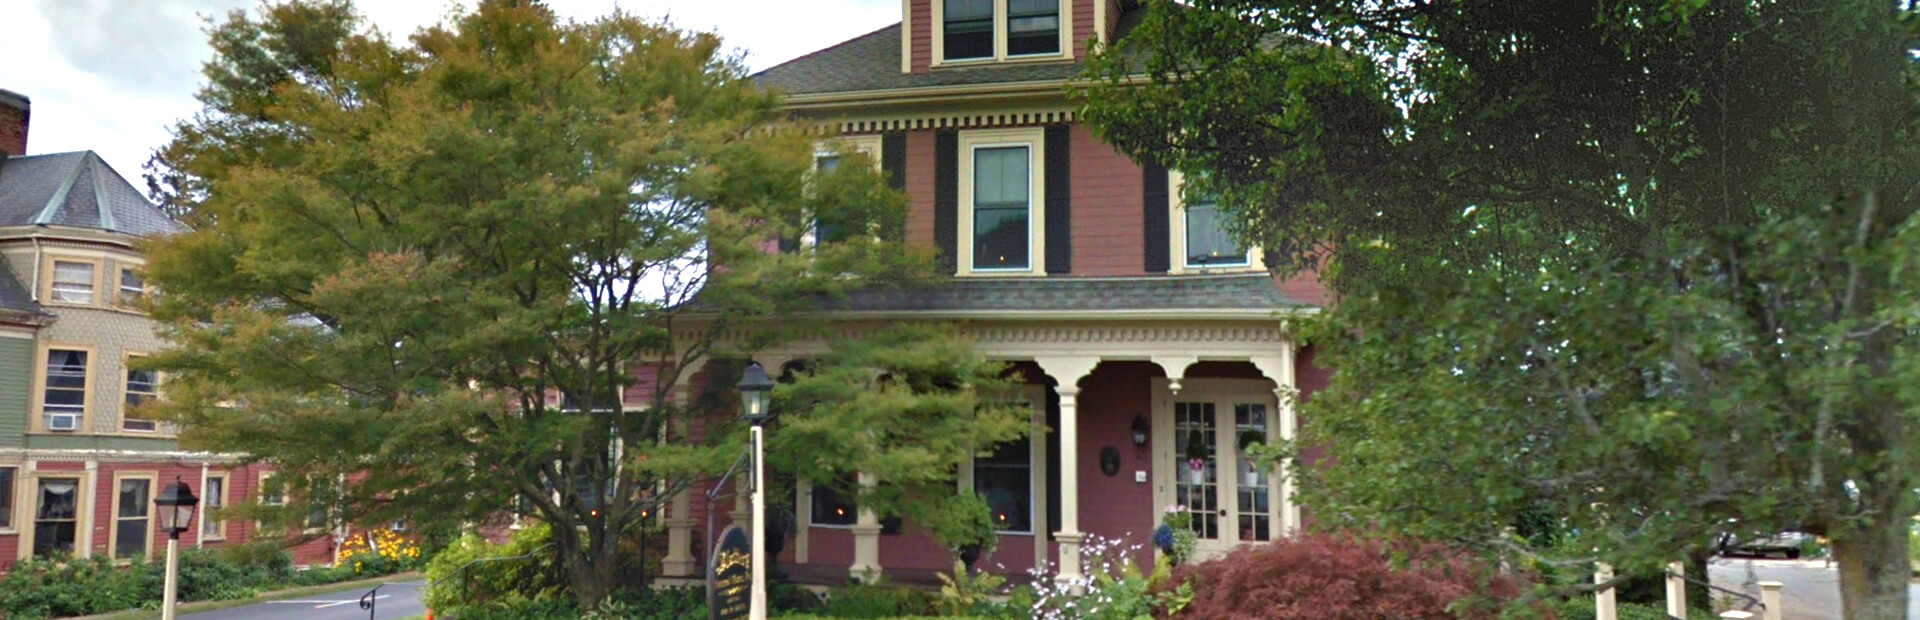 funeral home in Marlborough, MA